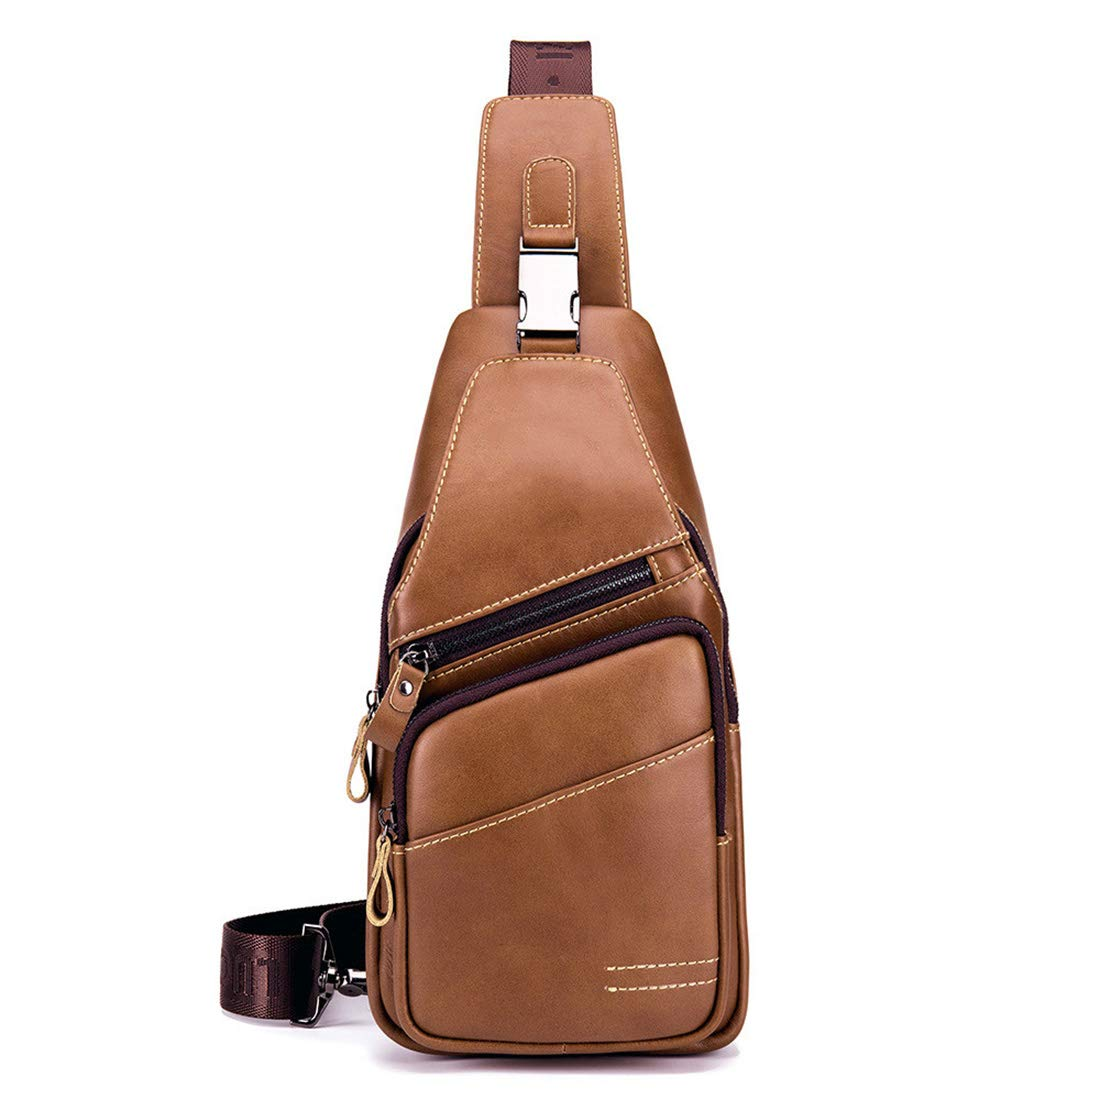 Mens Sling Pack Chest Bag Genuine Cow Leather Crossbody Shoulder Bag Men Cowhide Messenger Bag Zipper Casual,Black,16cm X8cm X32cm